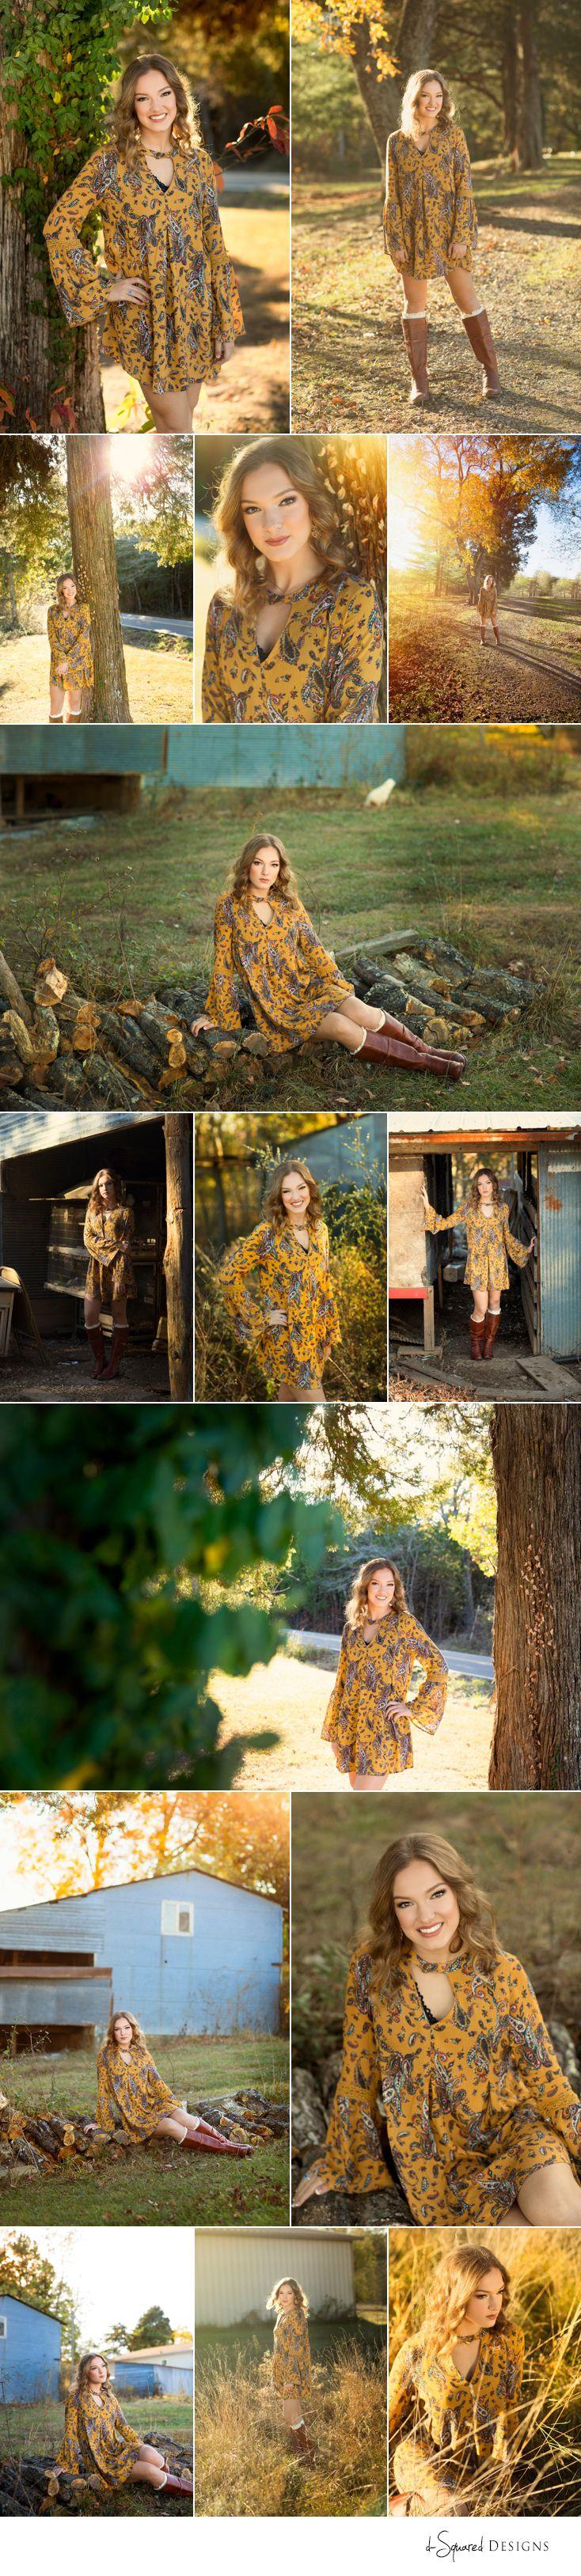 Mallory | St. Louis, MO Senior Photography | dsqdesigns.com